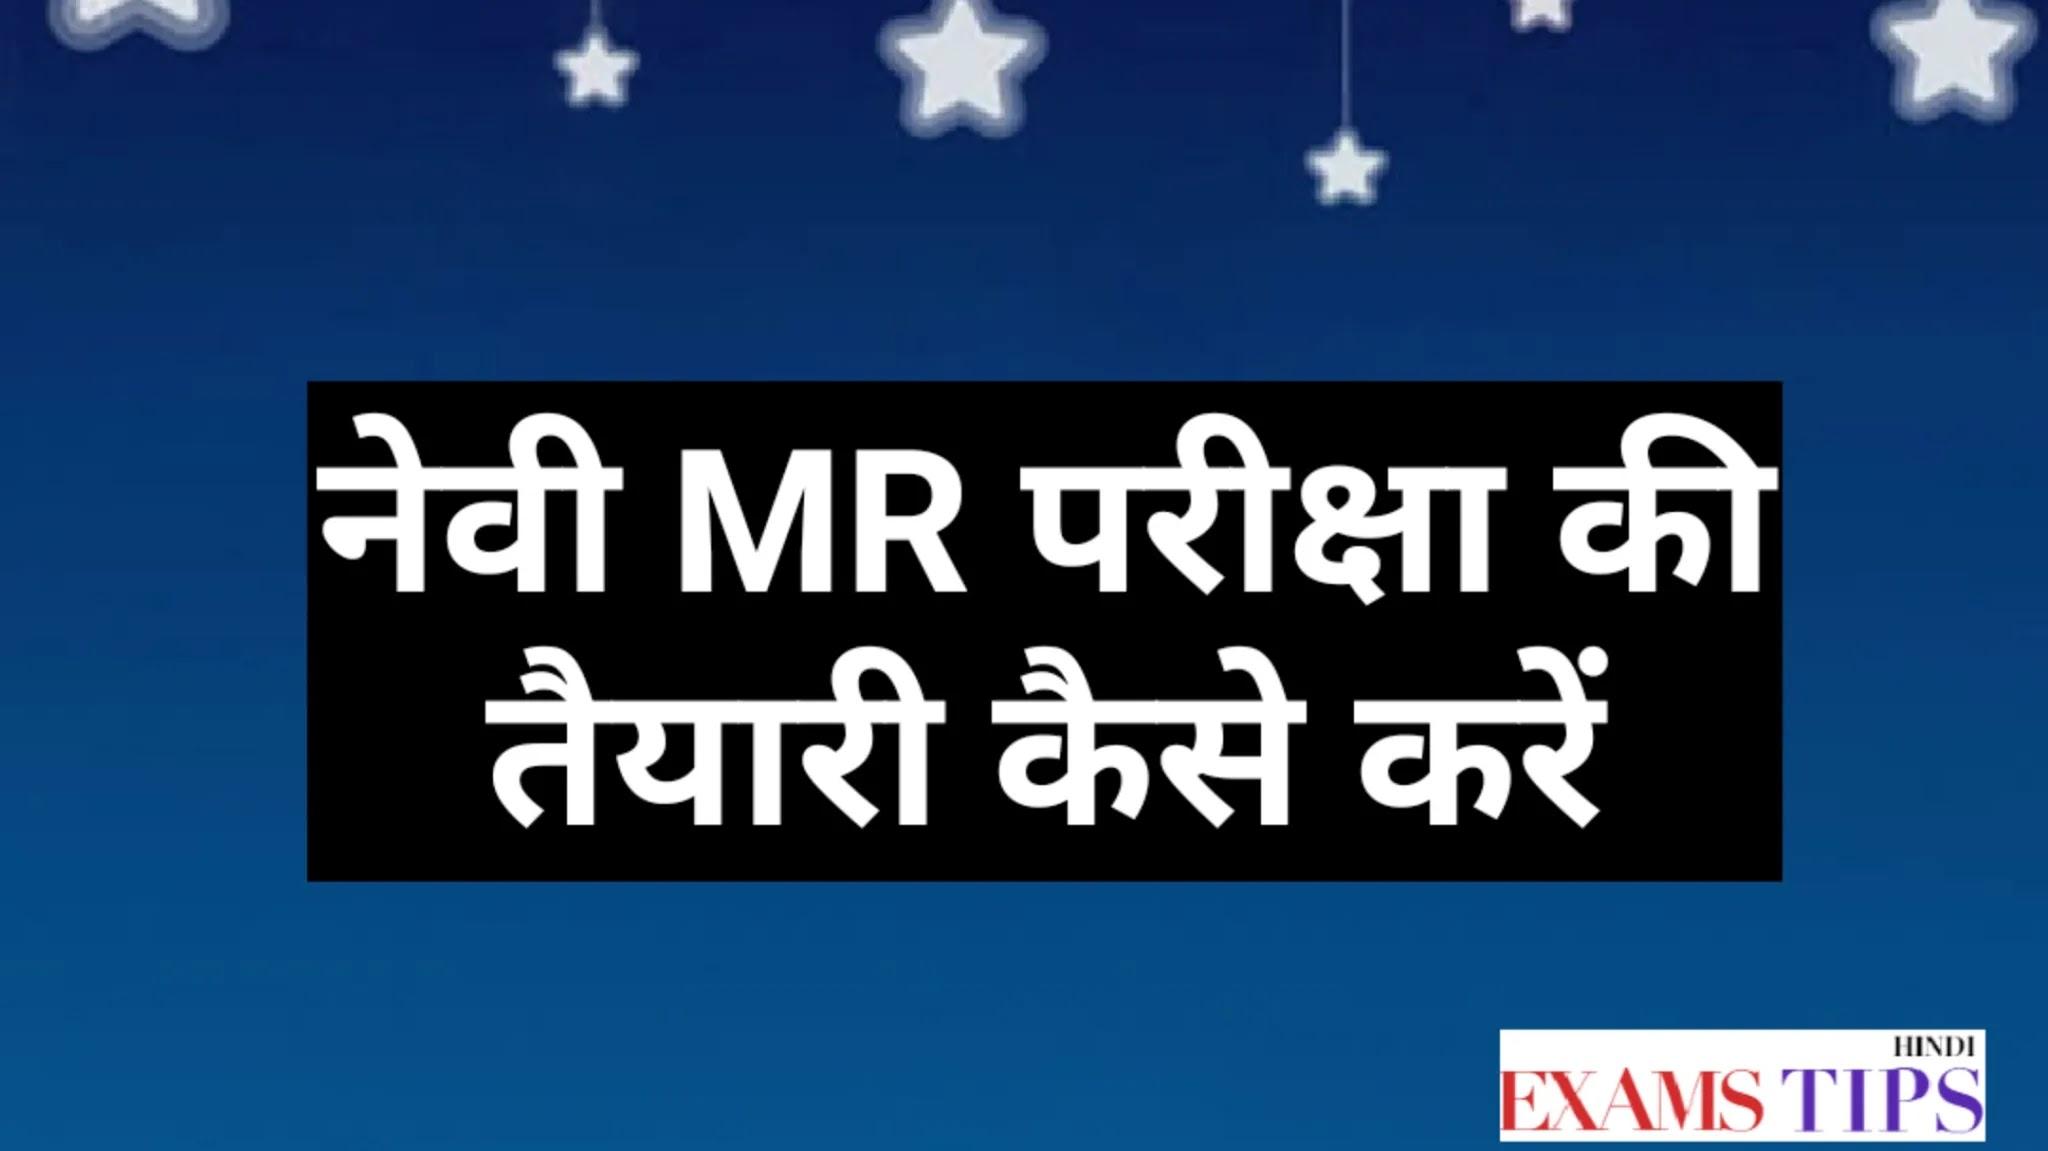 नेवी MR परीक्षा की तैयारी कैसे करें, Navy MR Exam Tips in Hindi, navy mr priksha ki taiyari kaise kare, navy mr exam tips